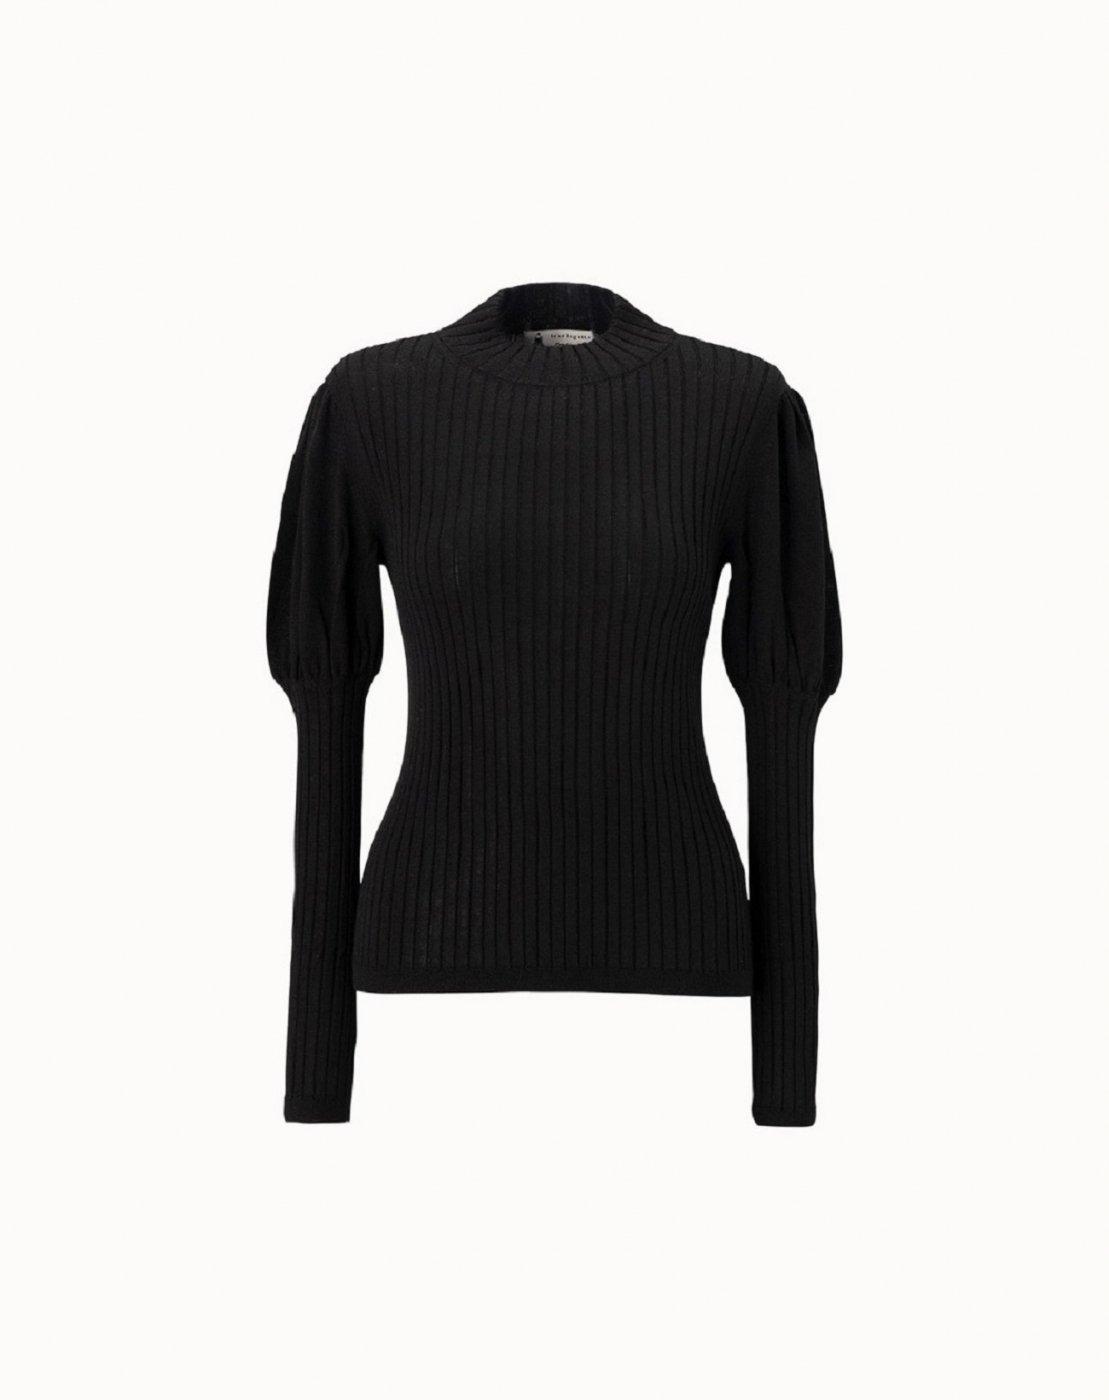 leur logette - Cashmere Silk Rib Top - Black